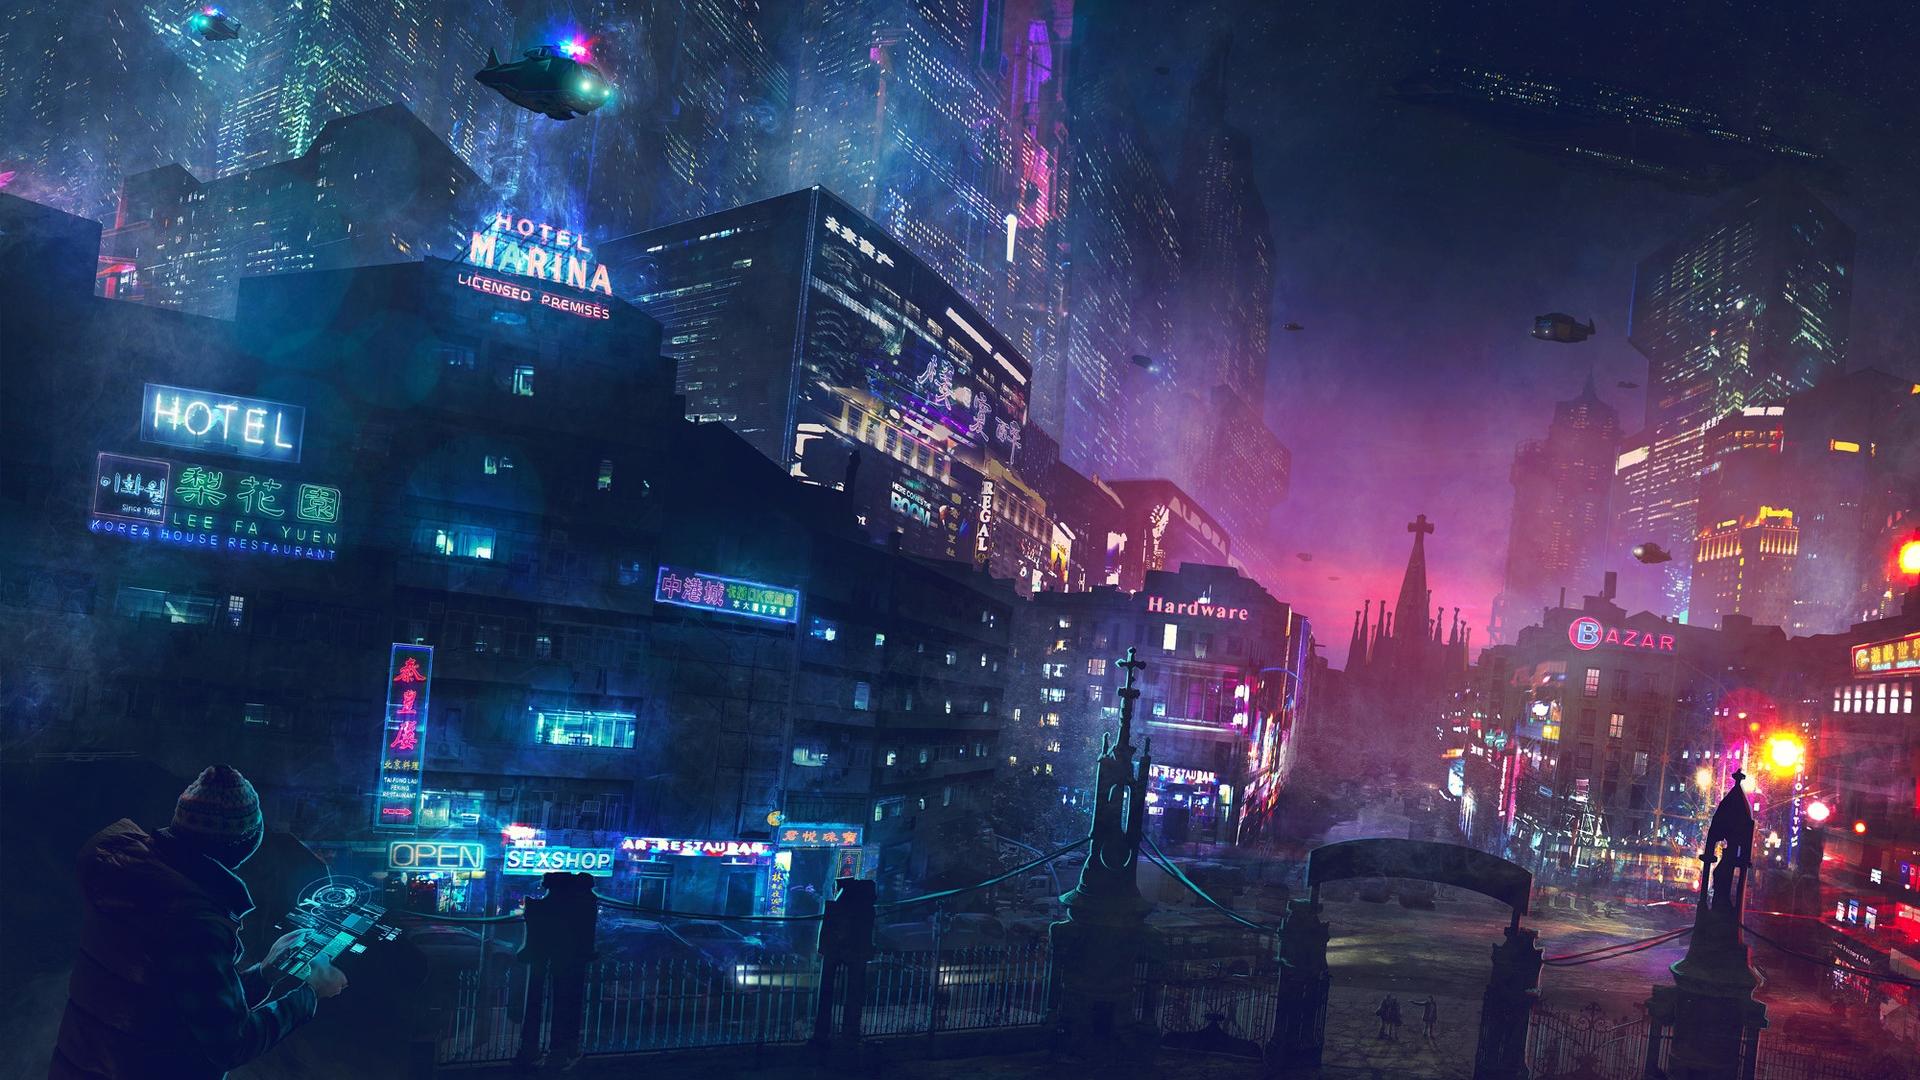 General 1920x1080 digital art science fiction city cyberpunk